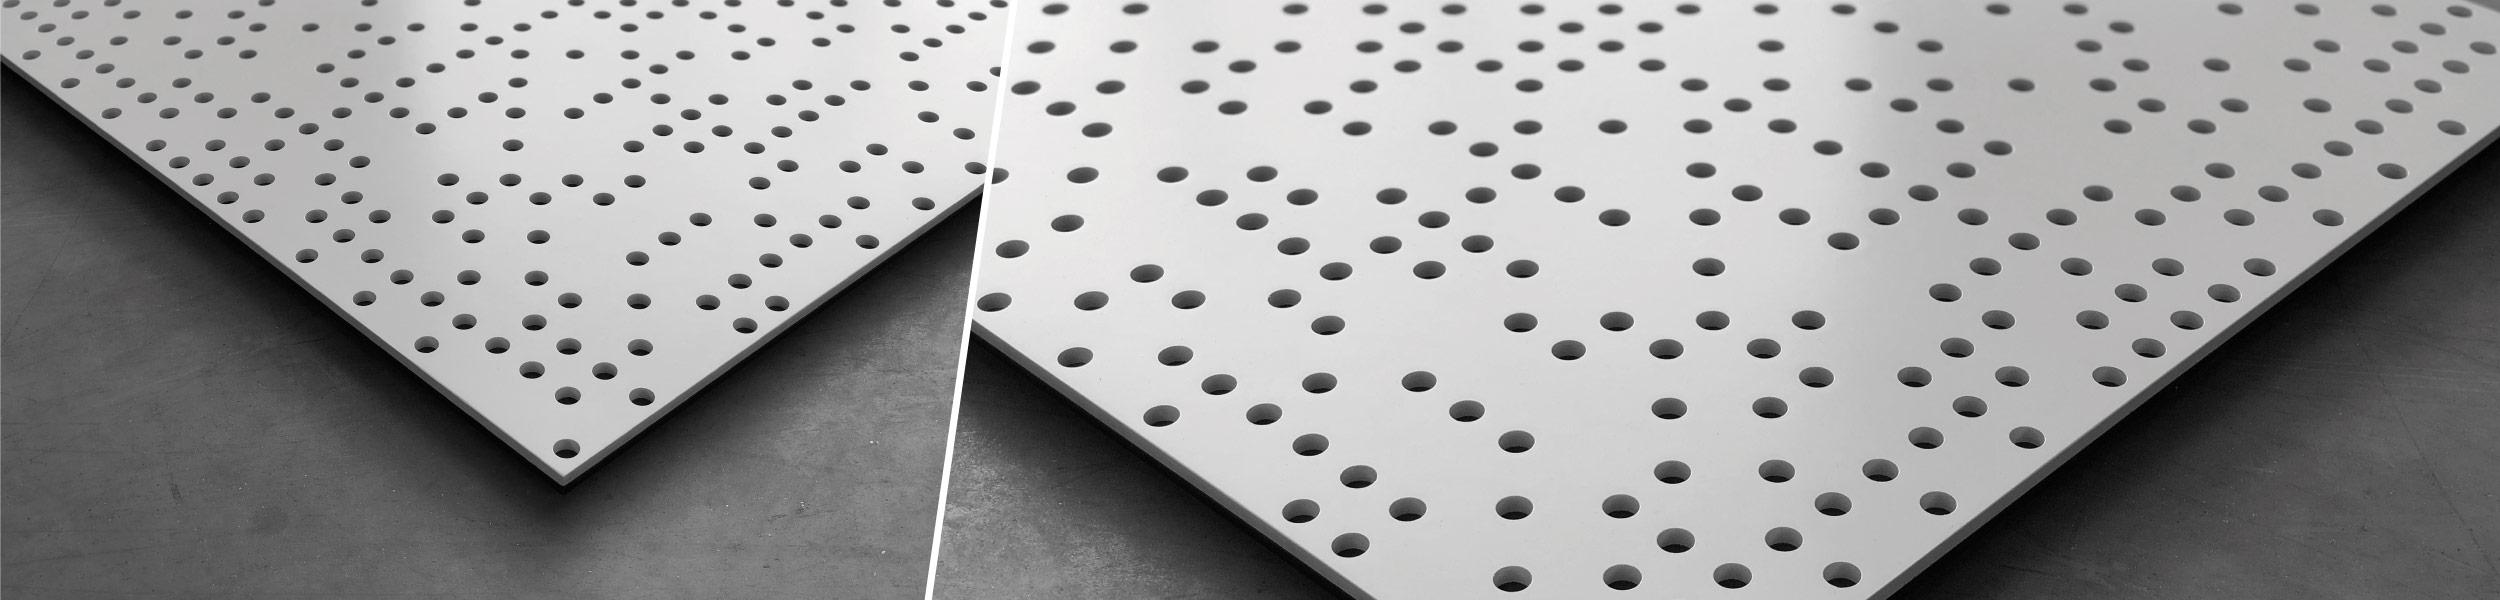 Artnovion product lyra panelling range 3e045c0ecb